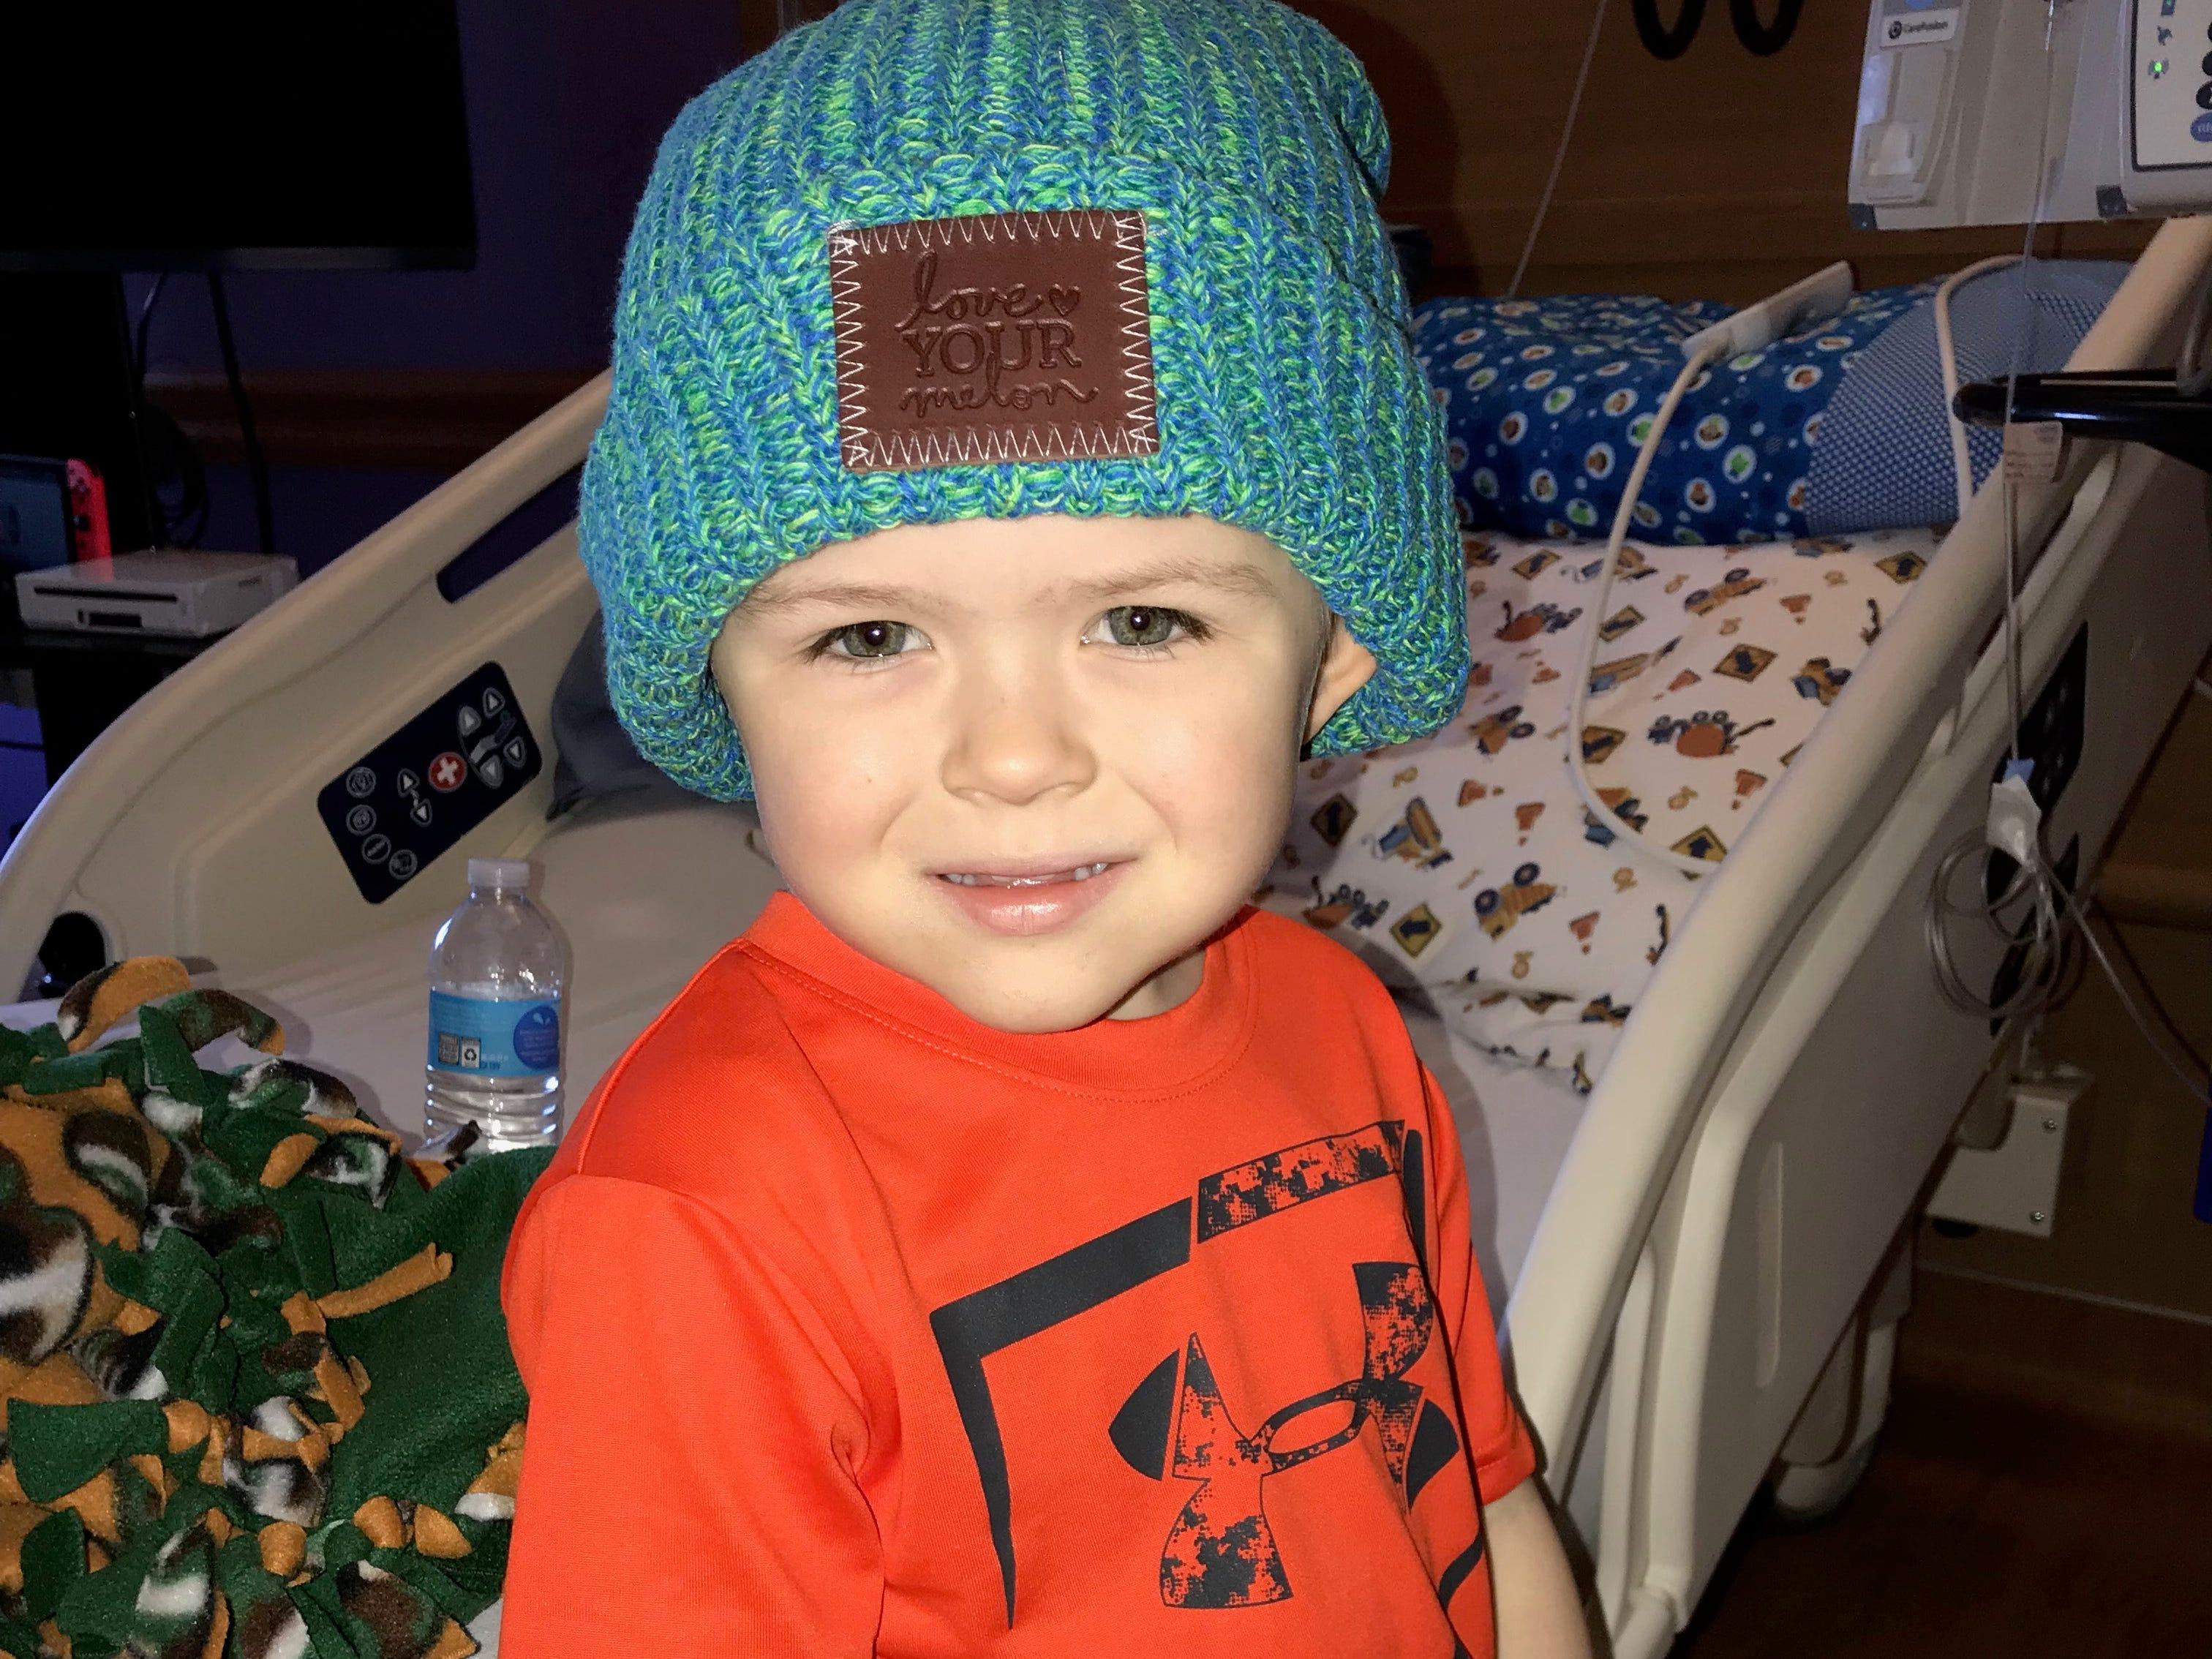 Lincoln Maziasz poses in his Love your Melon hat.